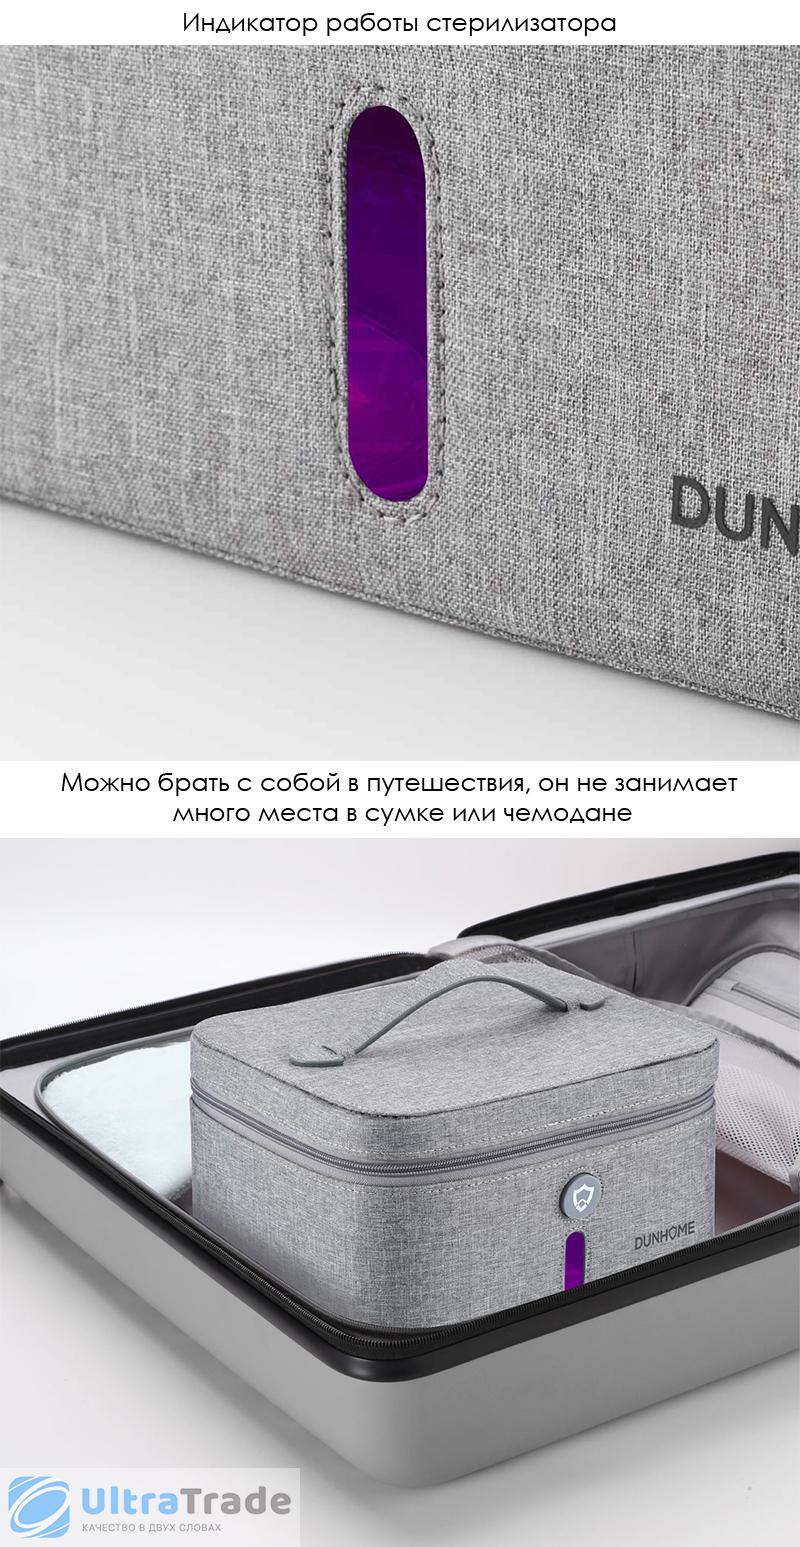 Портативная коробка-стерилизатор Xiaomi Dunhome Small Shield Deodorant Sterilization Box Gray